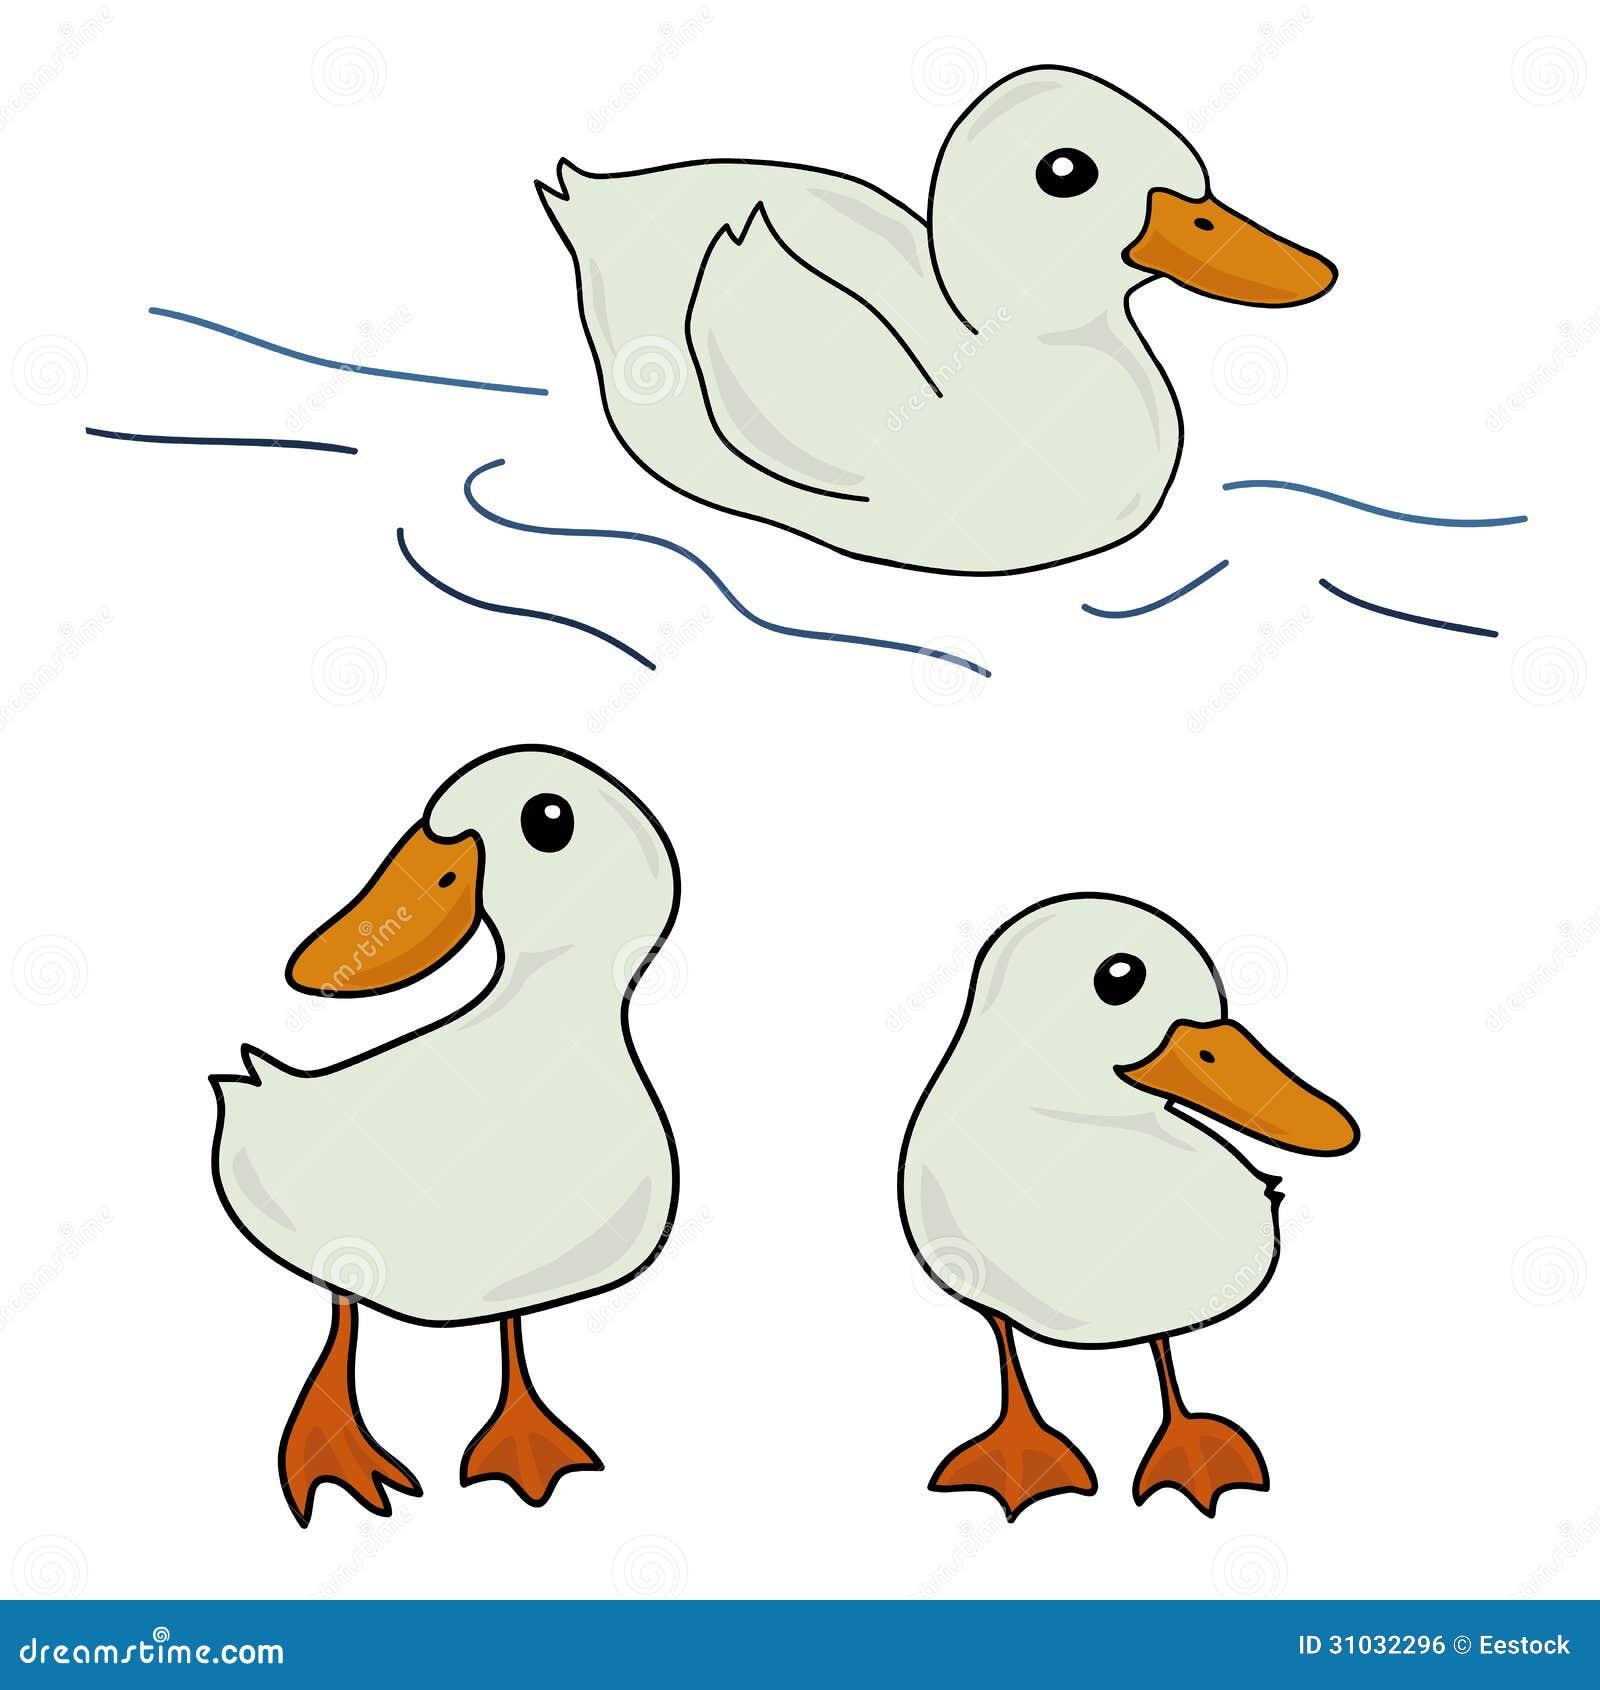 Cute Cartoon Character Design : Set of cute duck cartoon stock vector illustration